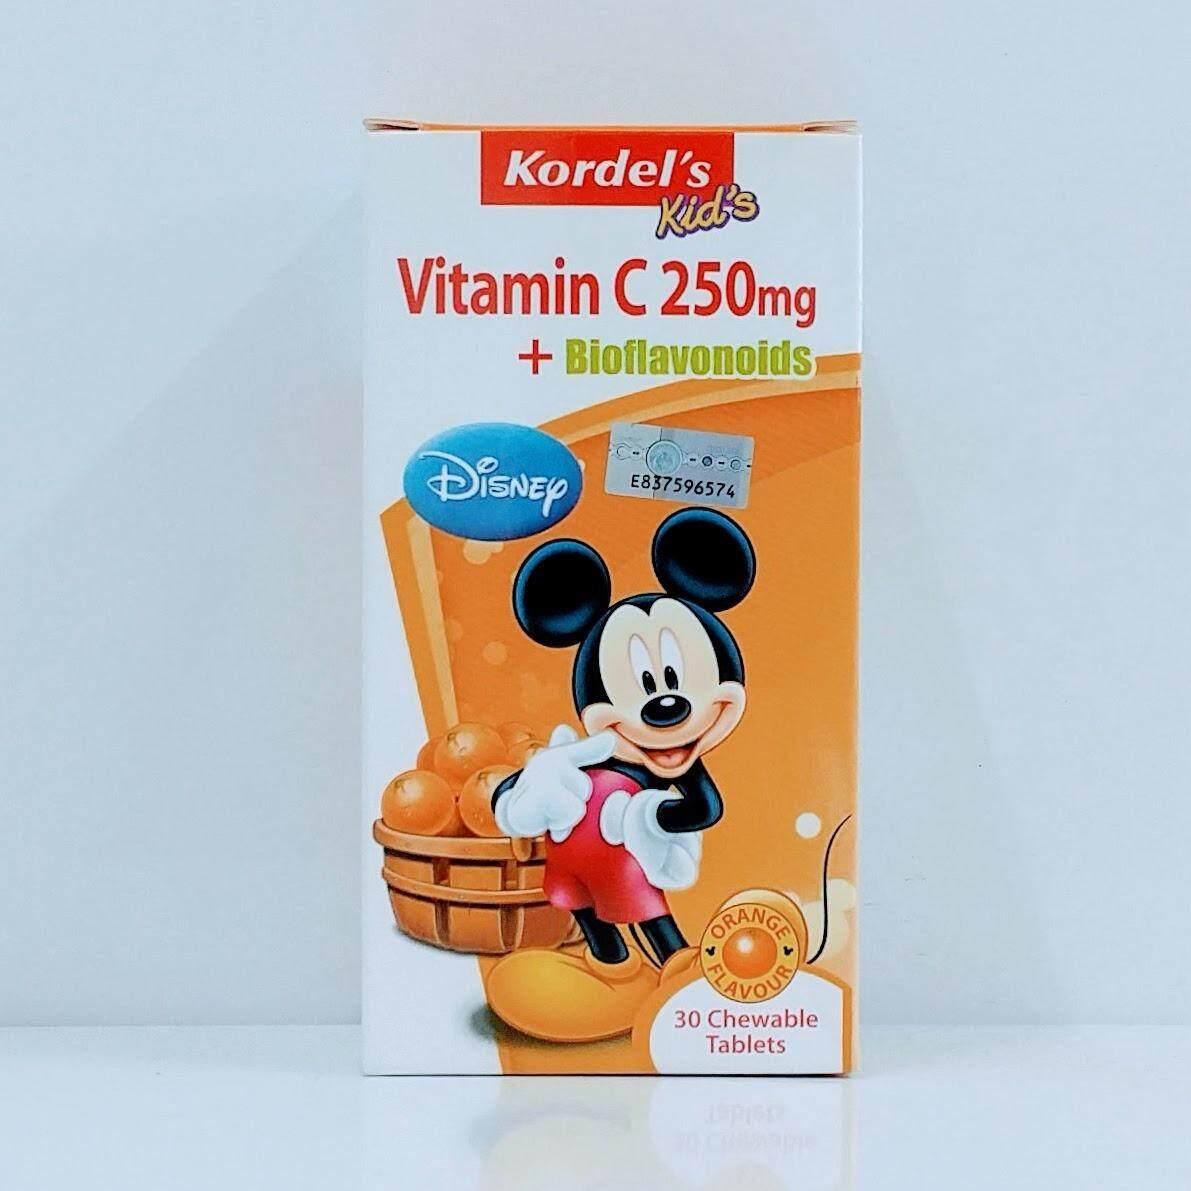 Kordel's Vitamin C 250mg + Bioflavonoids Orange Flavor Chew 30's (Exp01/20)